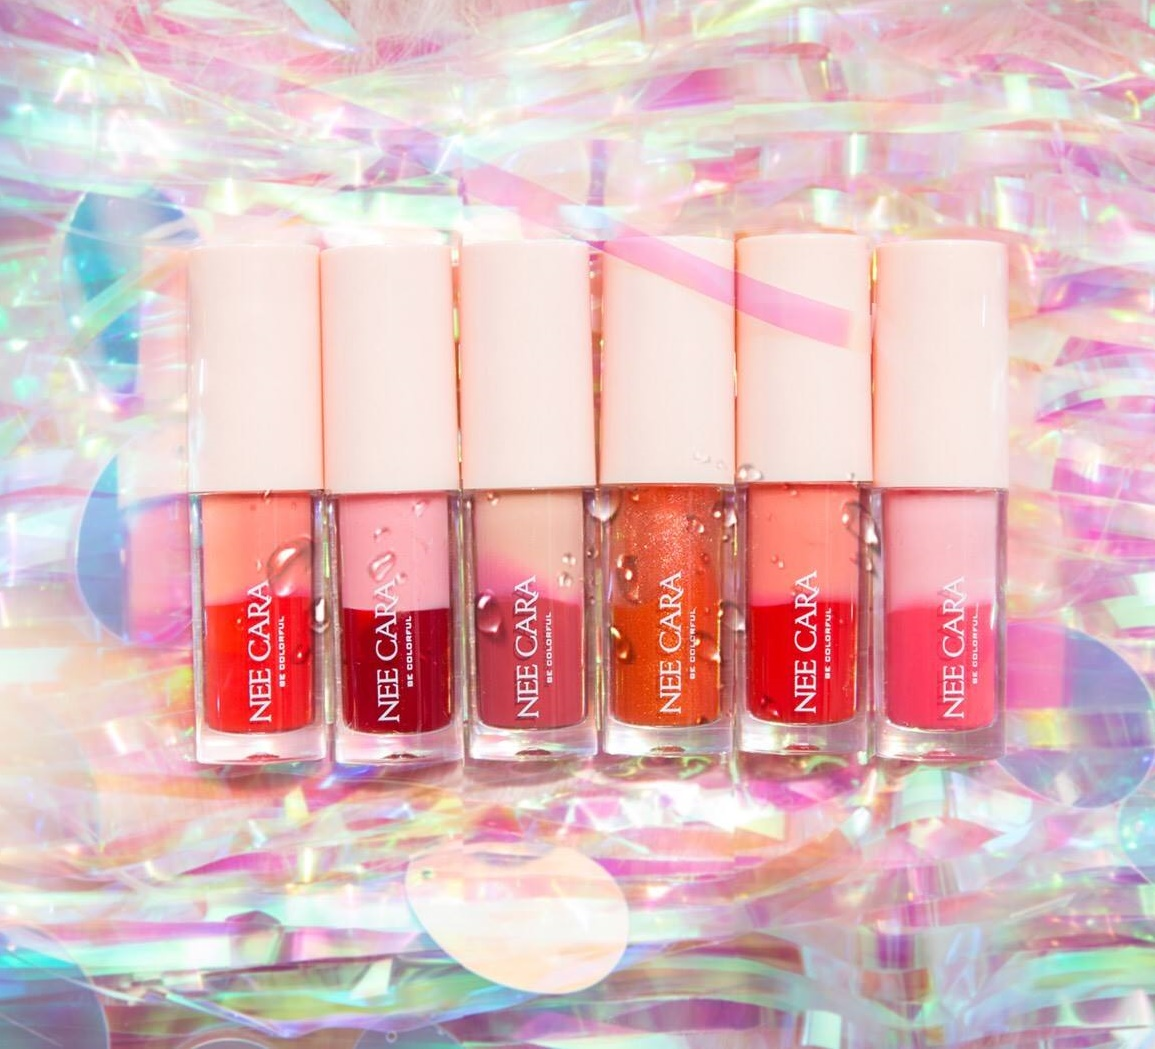 Lipstick Cara รหัสสินค้า Nee ลิปสติกเนื้อชิมเมอร์ Lt 2 Tone Liquid 28